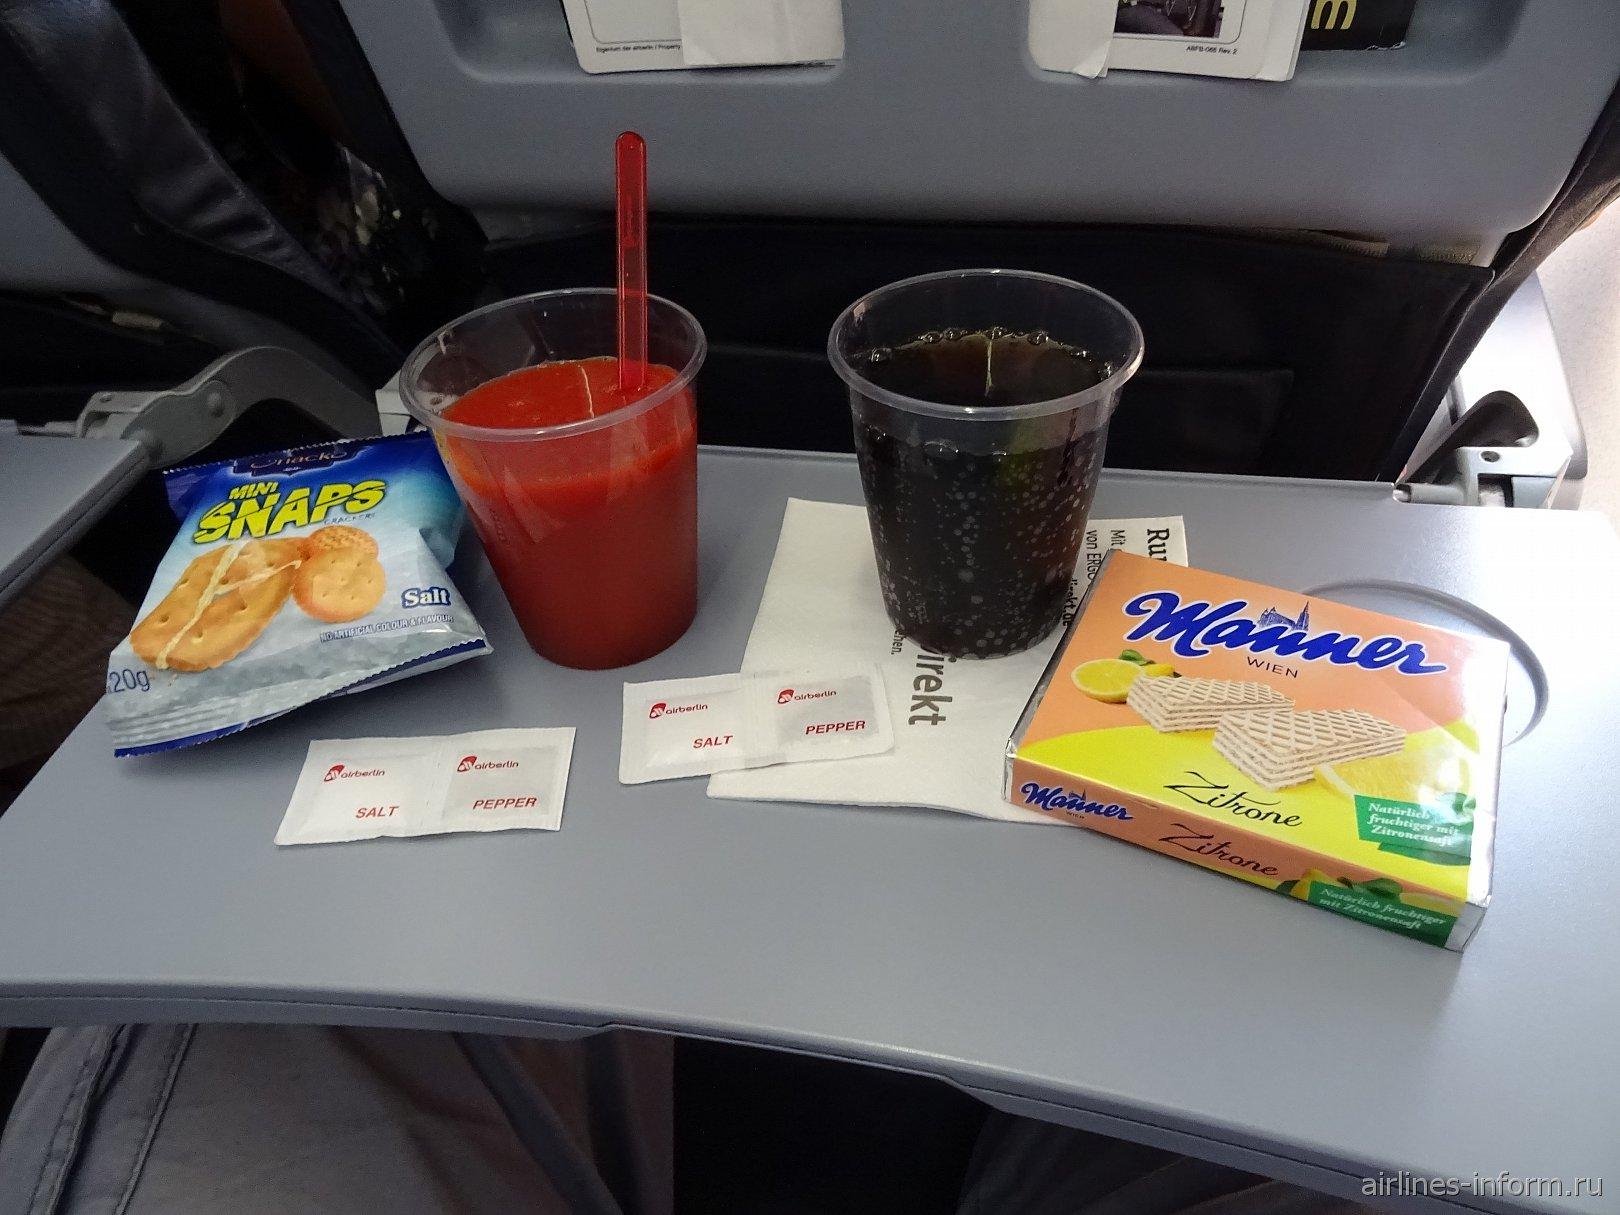 Бесплатное питание на рейсе Берлин-Москва авиакомпании airberlin